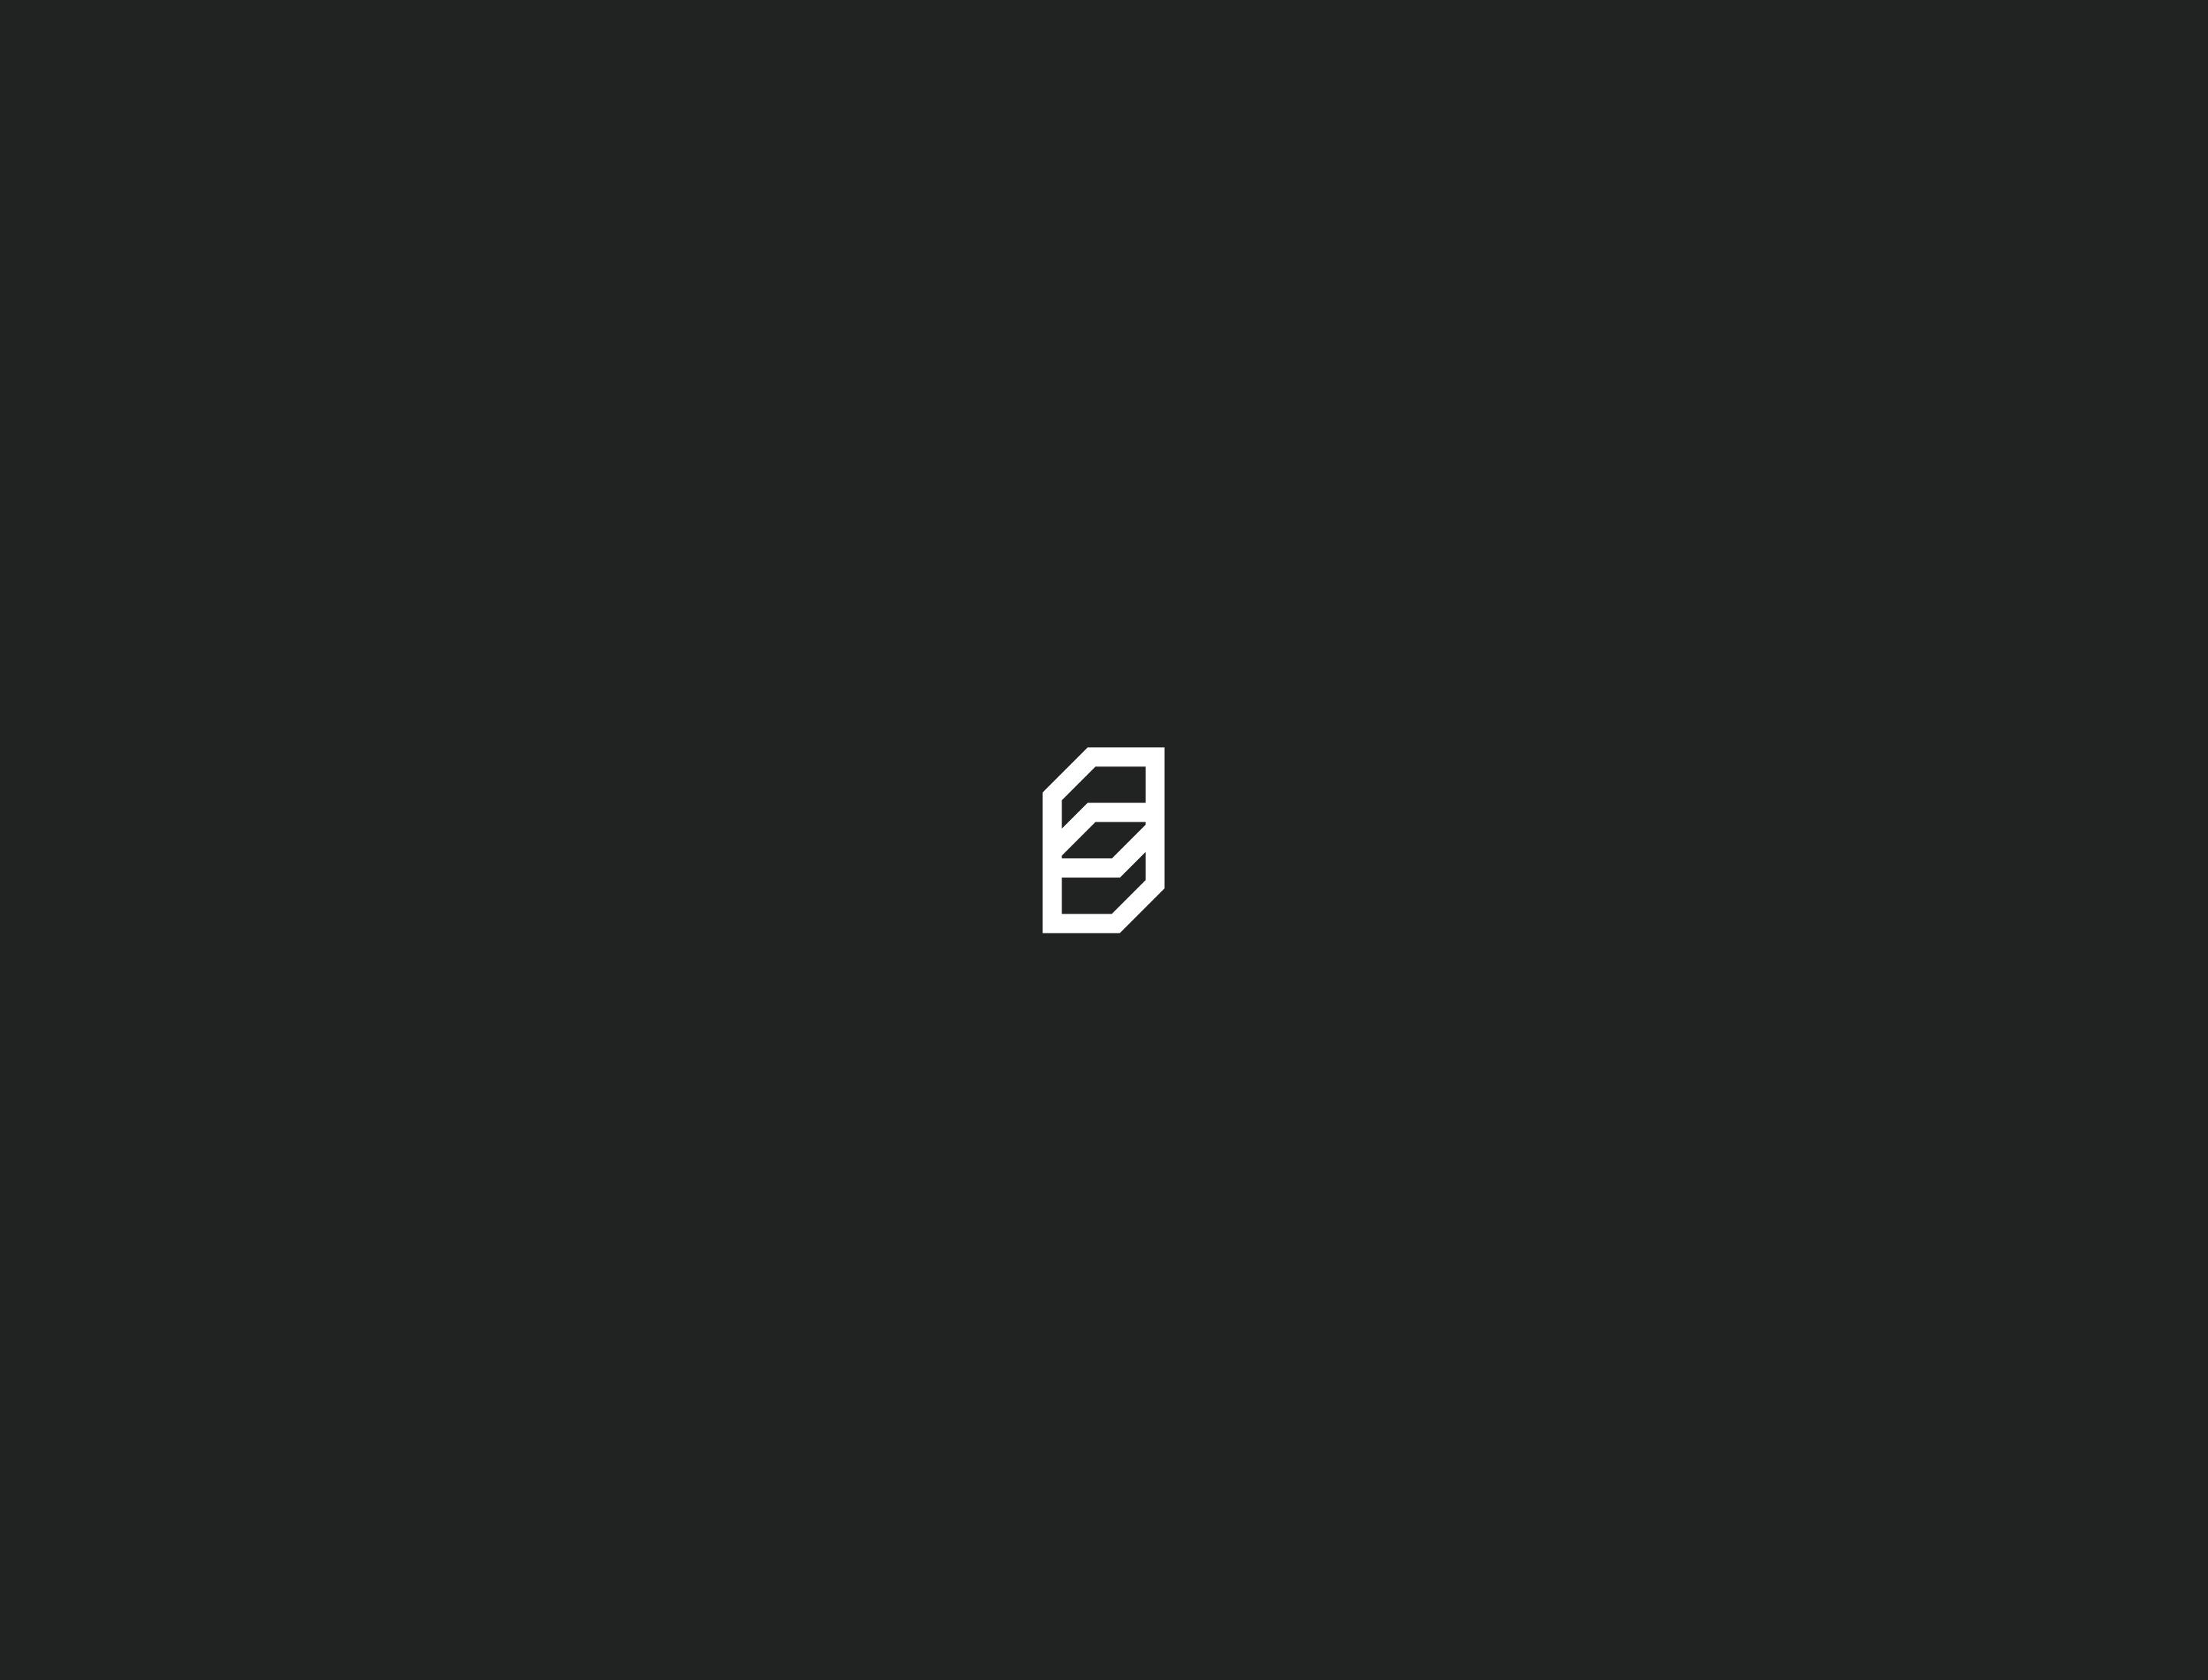 empresarial-vetores_simbolo